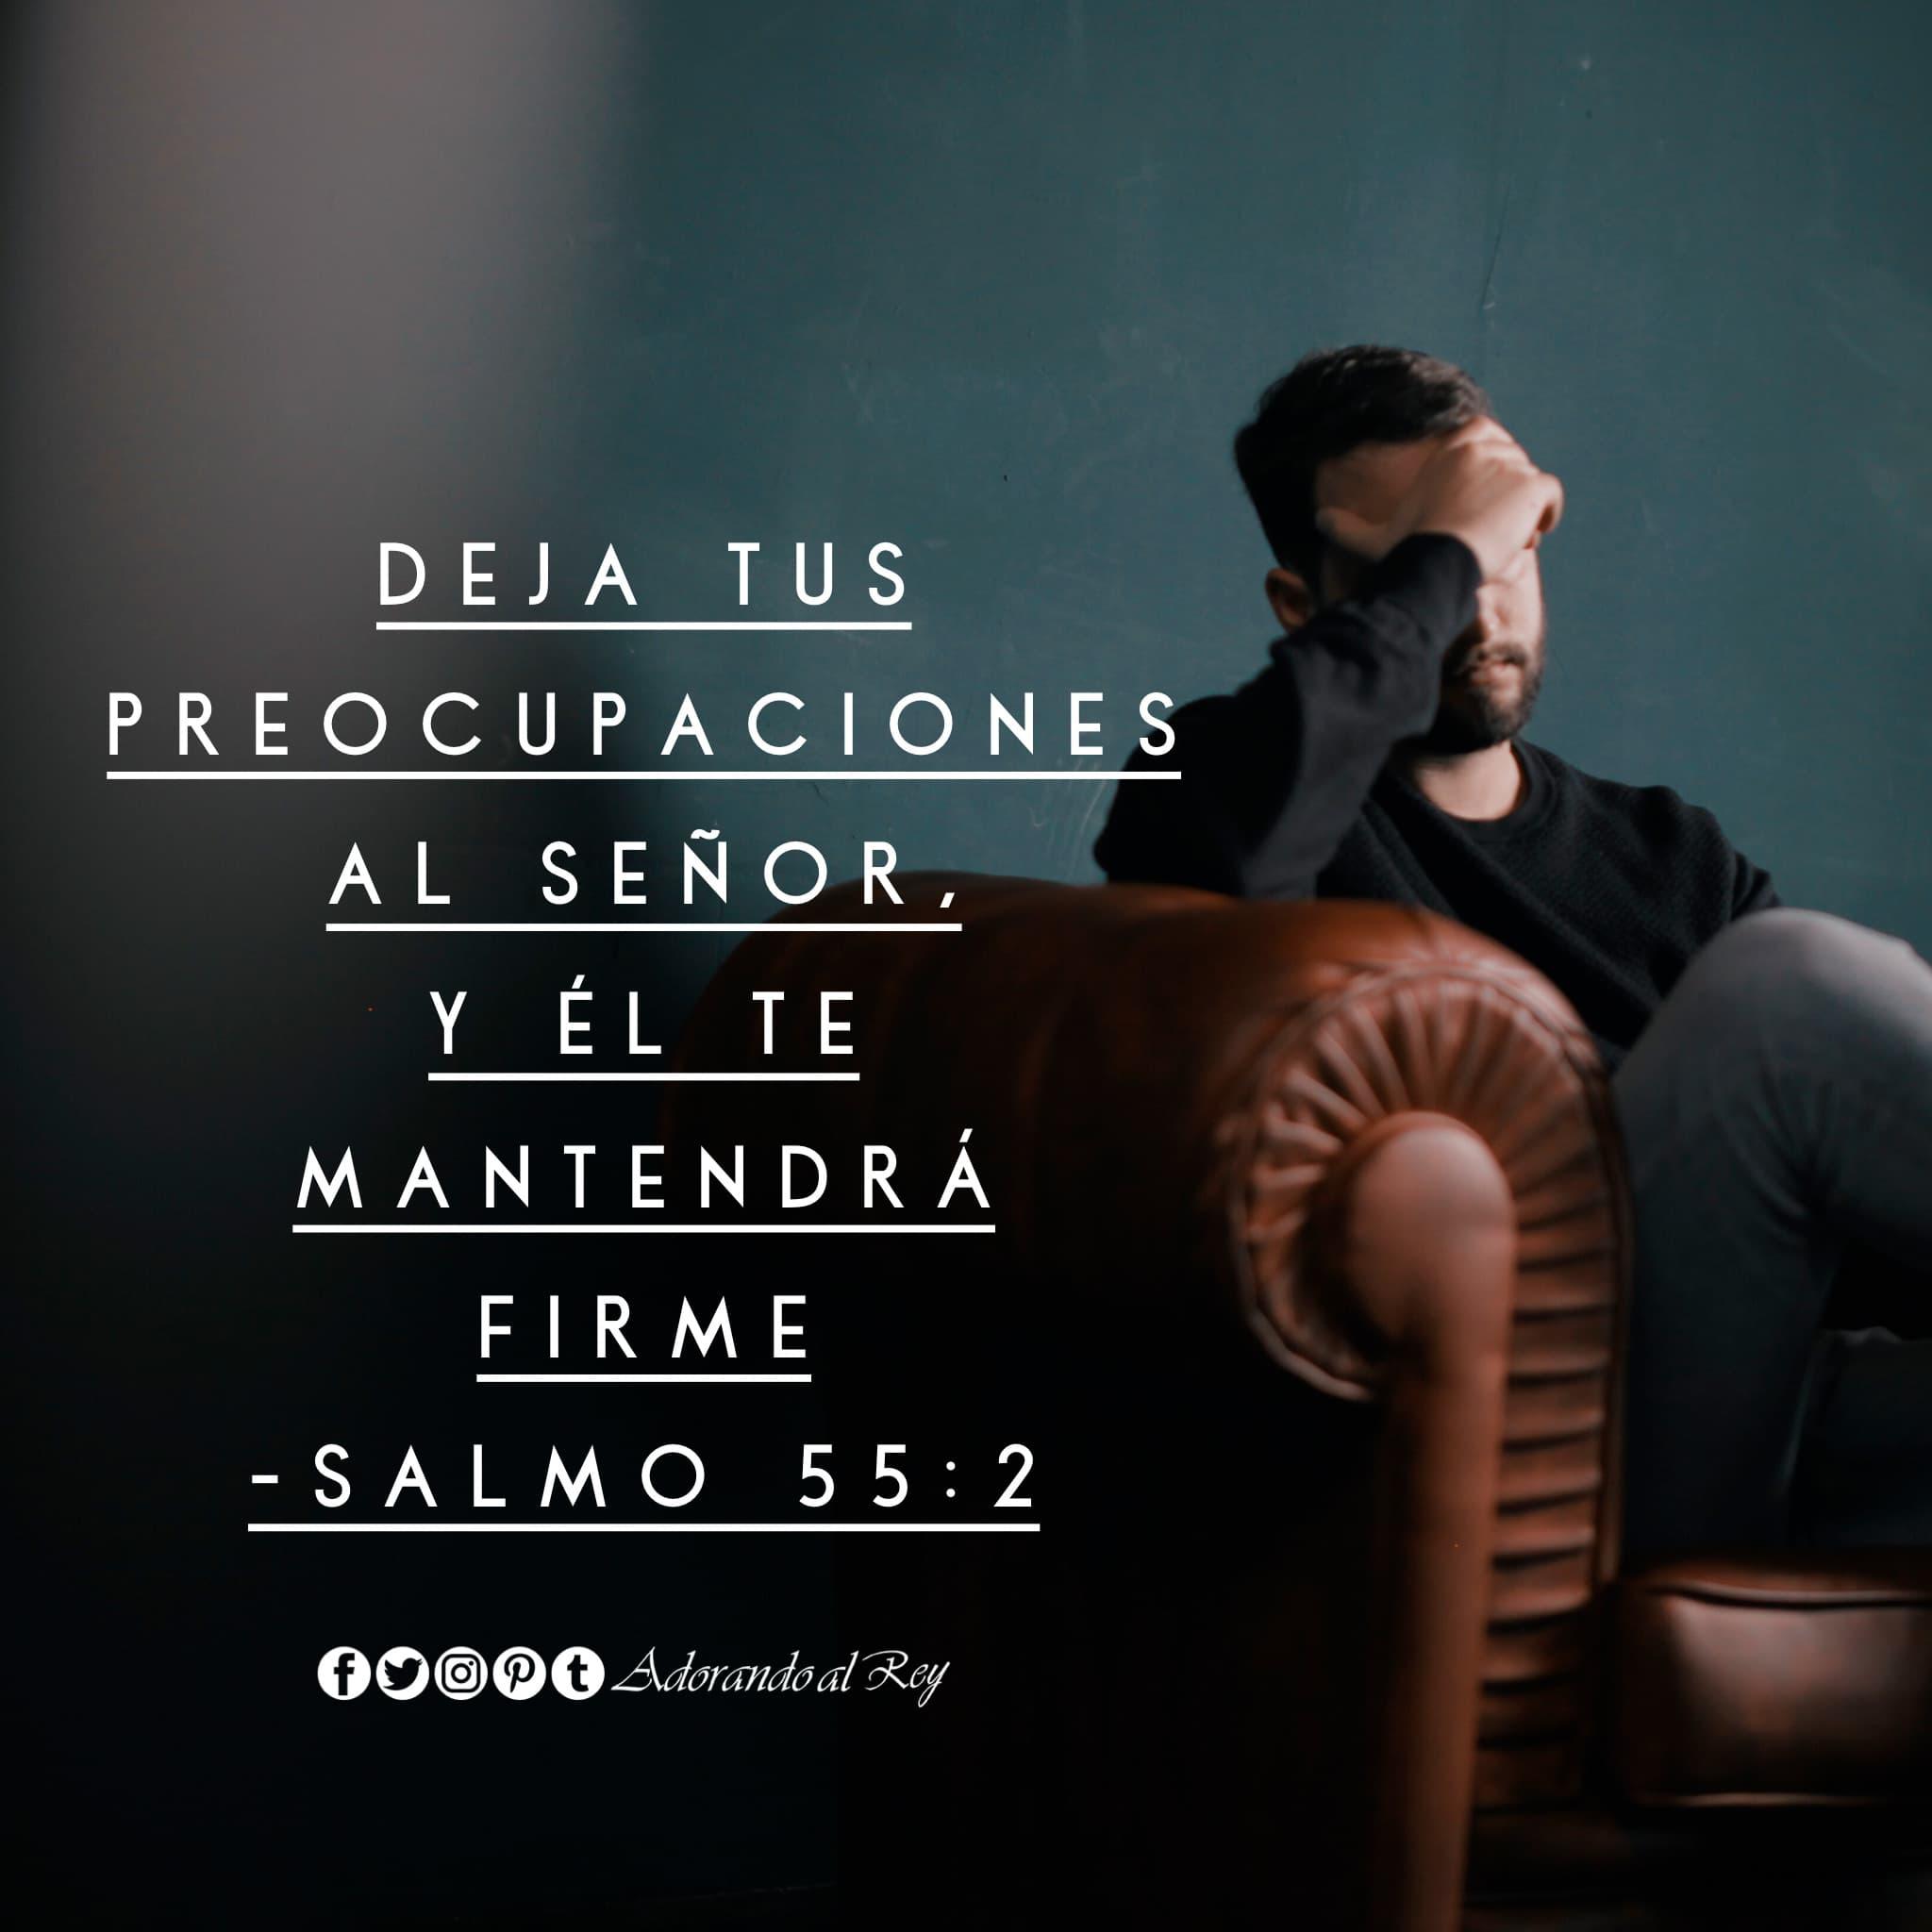 Salmo 55:2